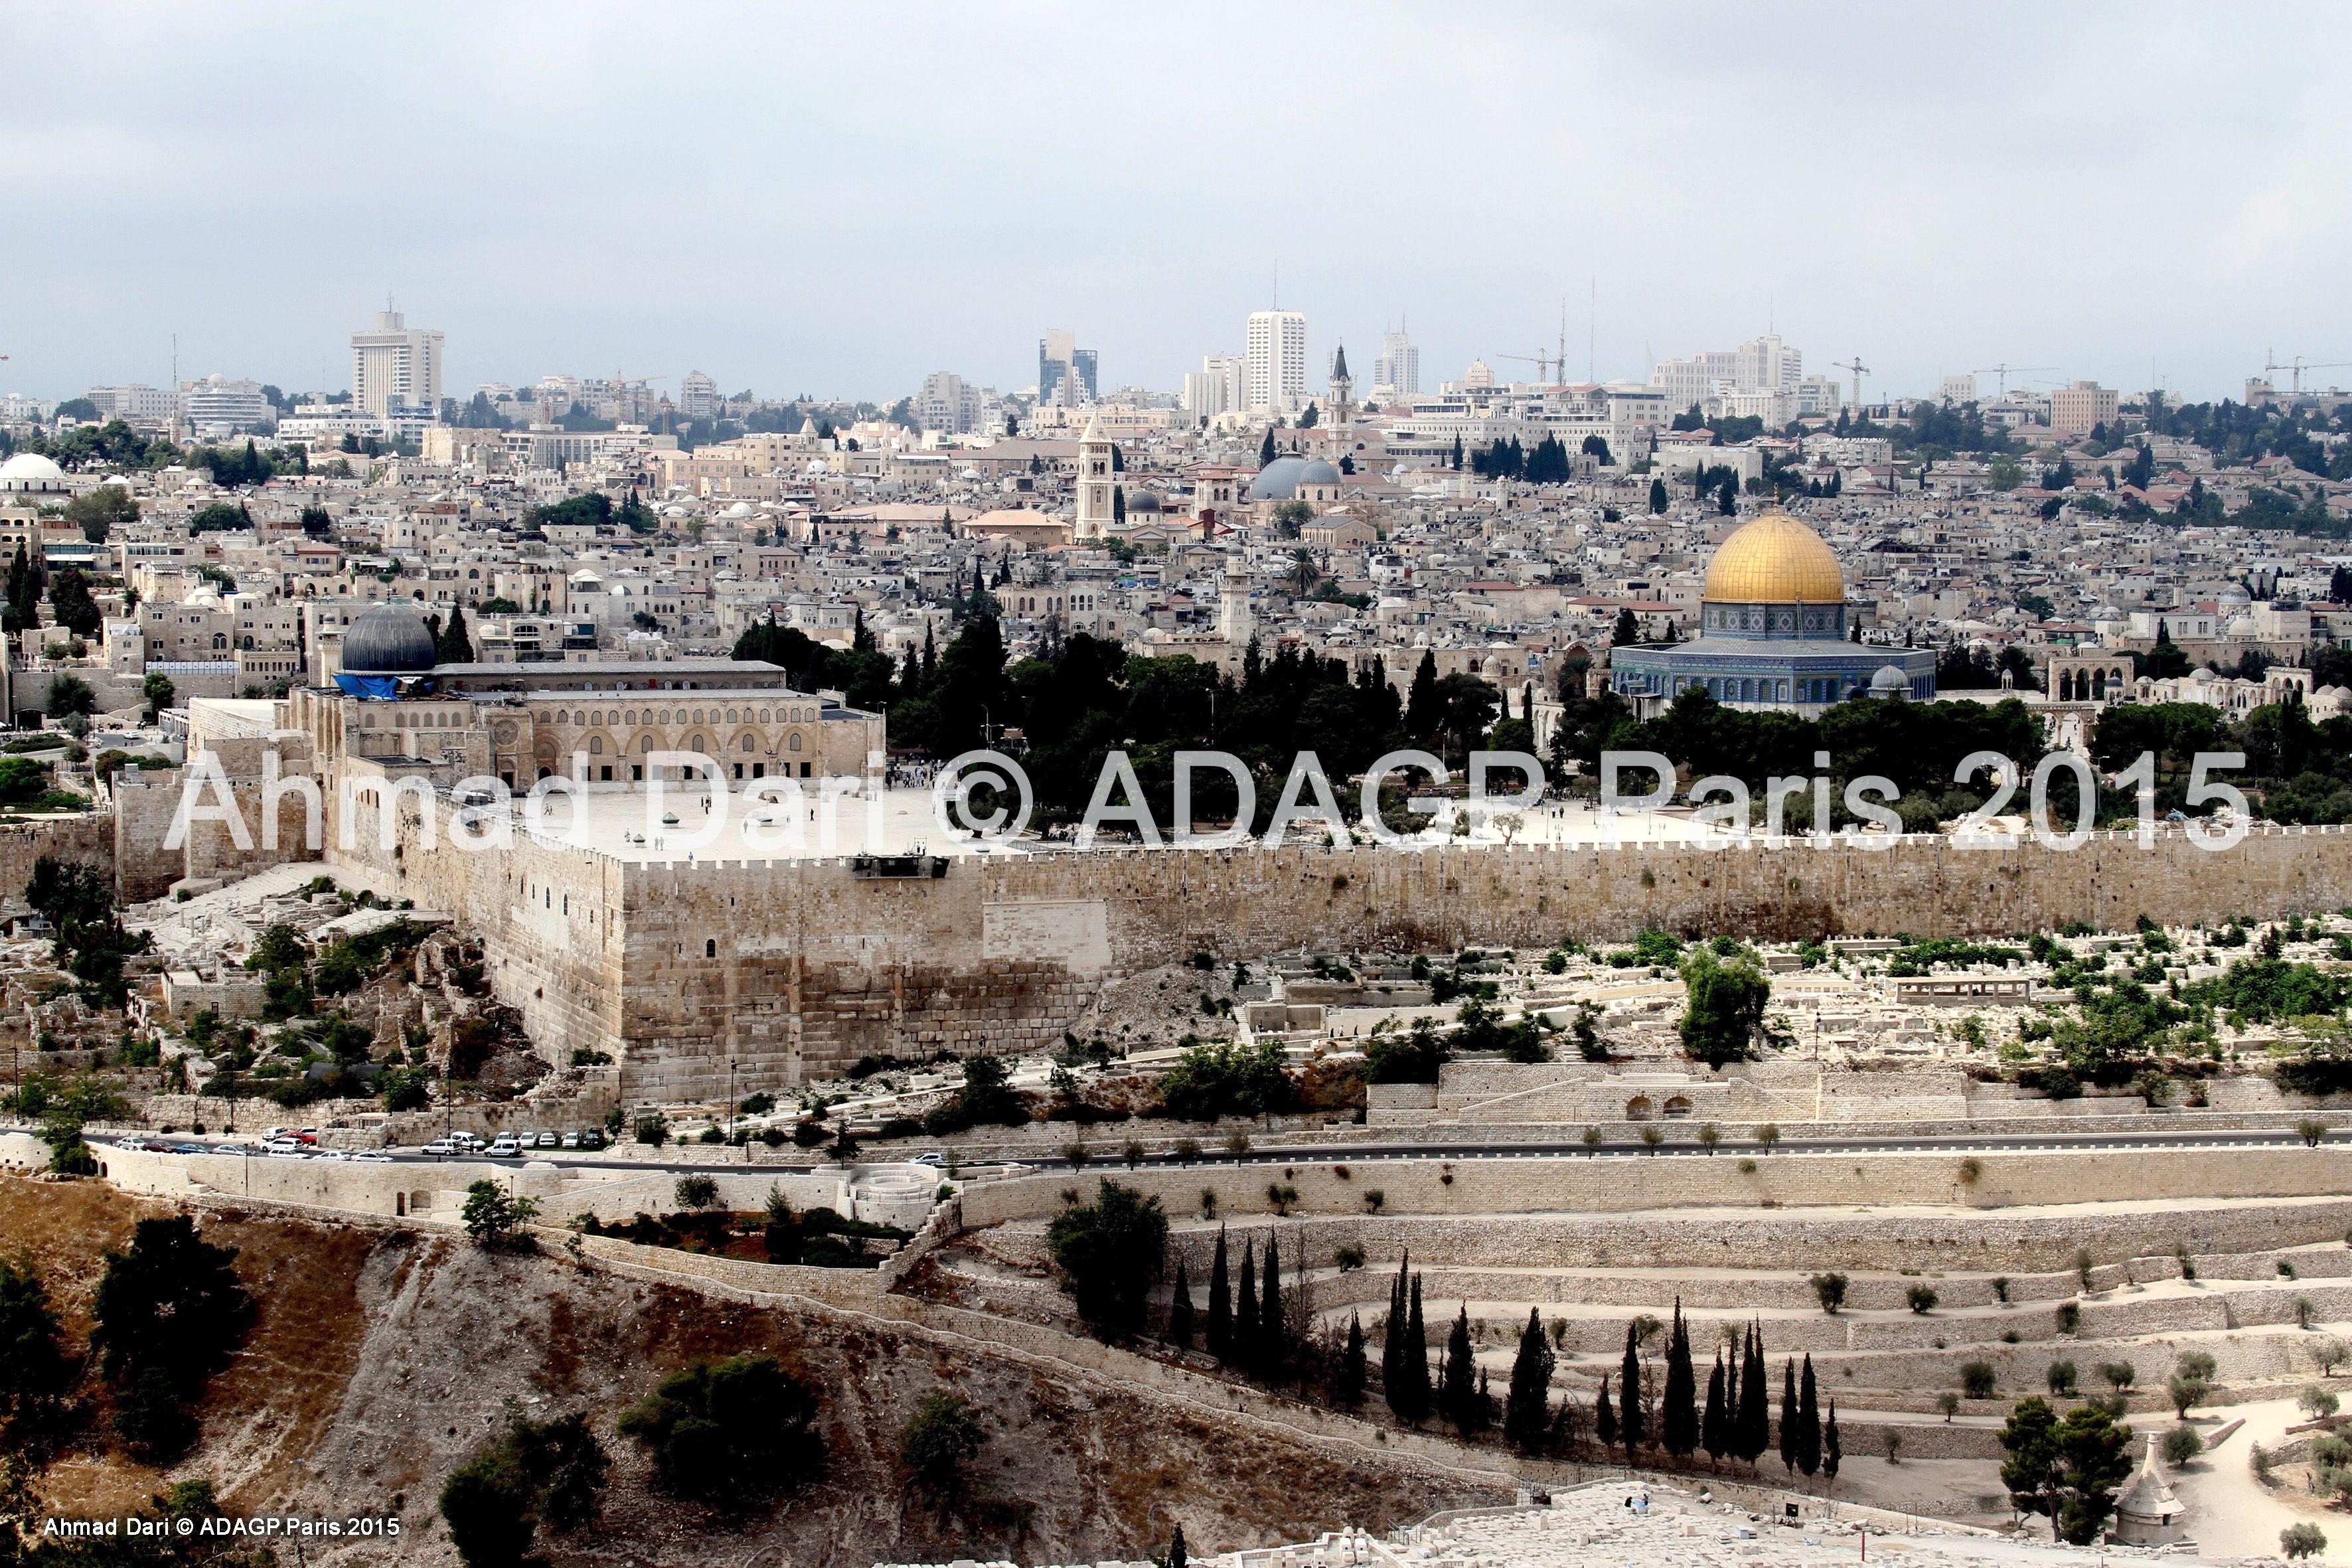 Jérusalem 0004 Ahmad Dari © ADAGP.Paris 2015